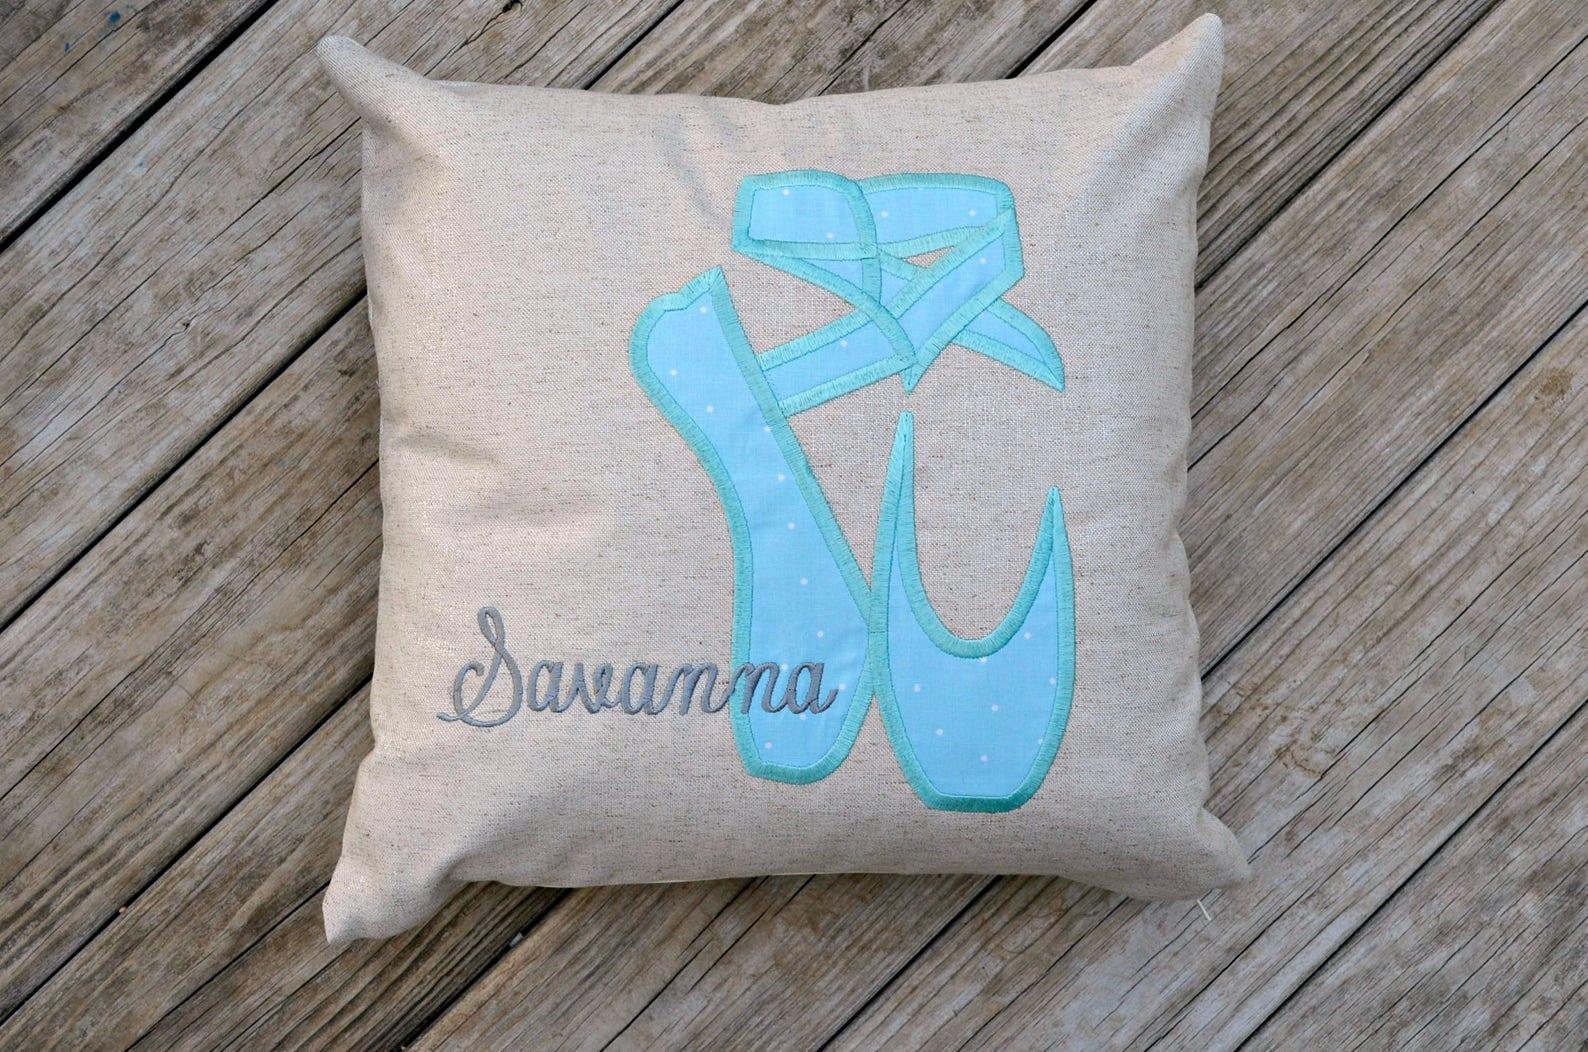 ballet decor,pointe shoes, ballet pillow, dancer decor, dancer gift, ballet art, girls bedroom decor, ballet christmas, nutcrack